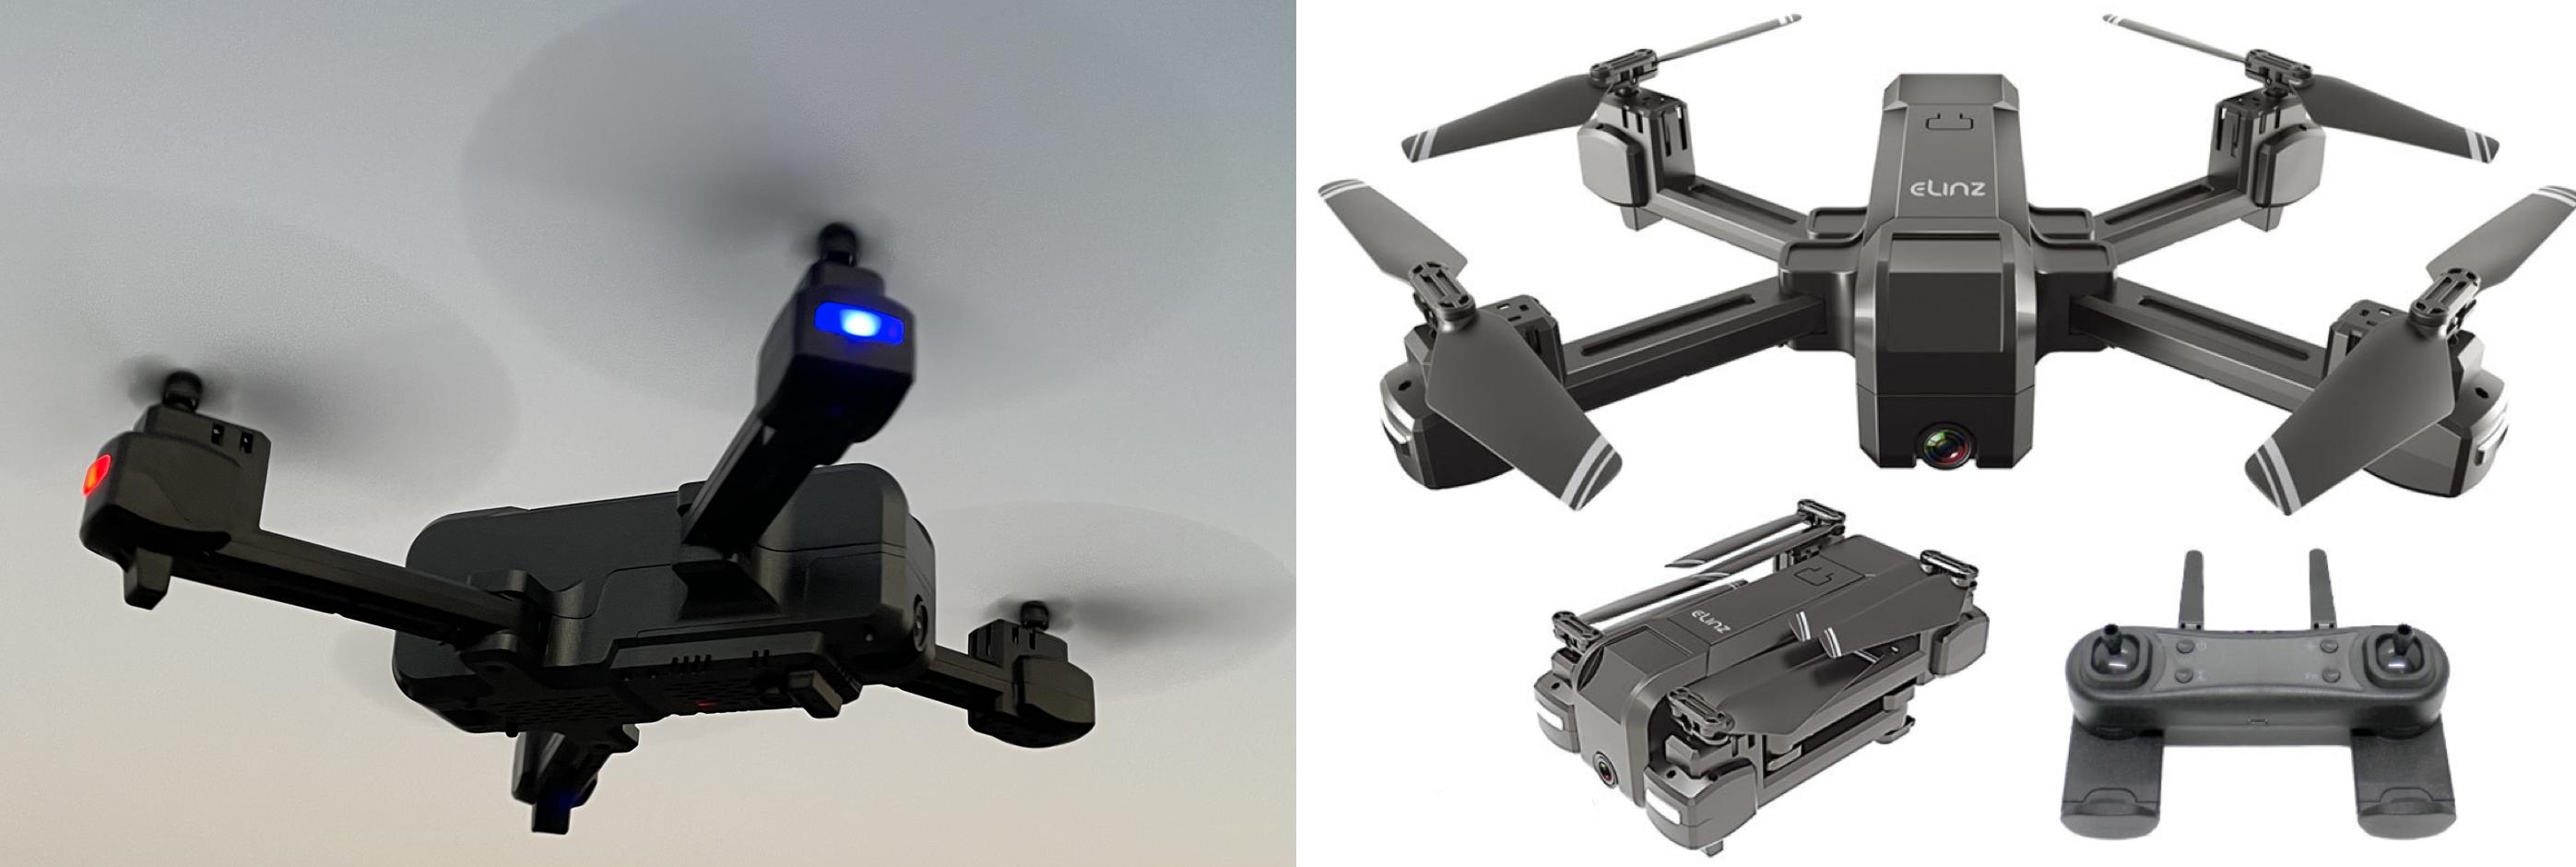 Elinz Electronics - drone